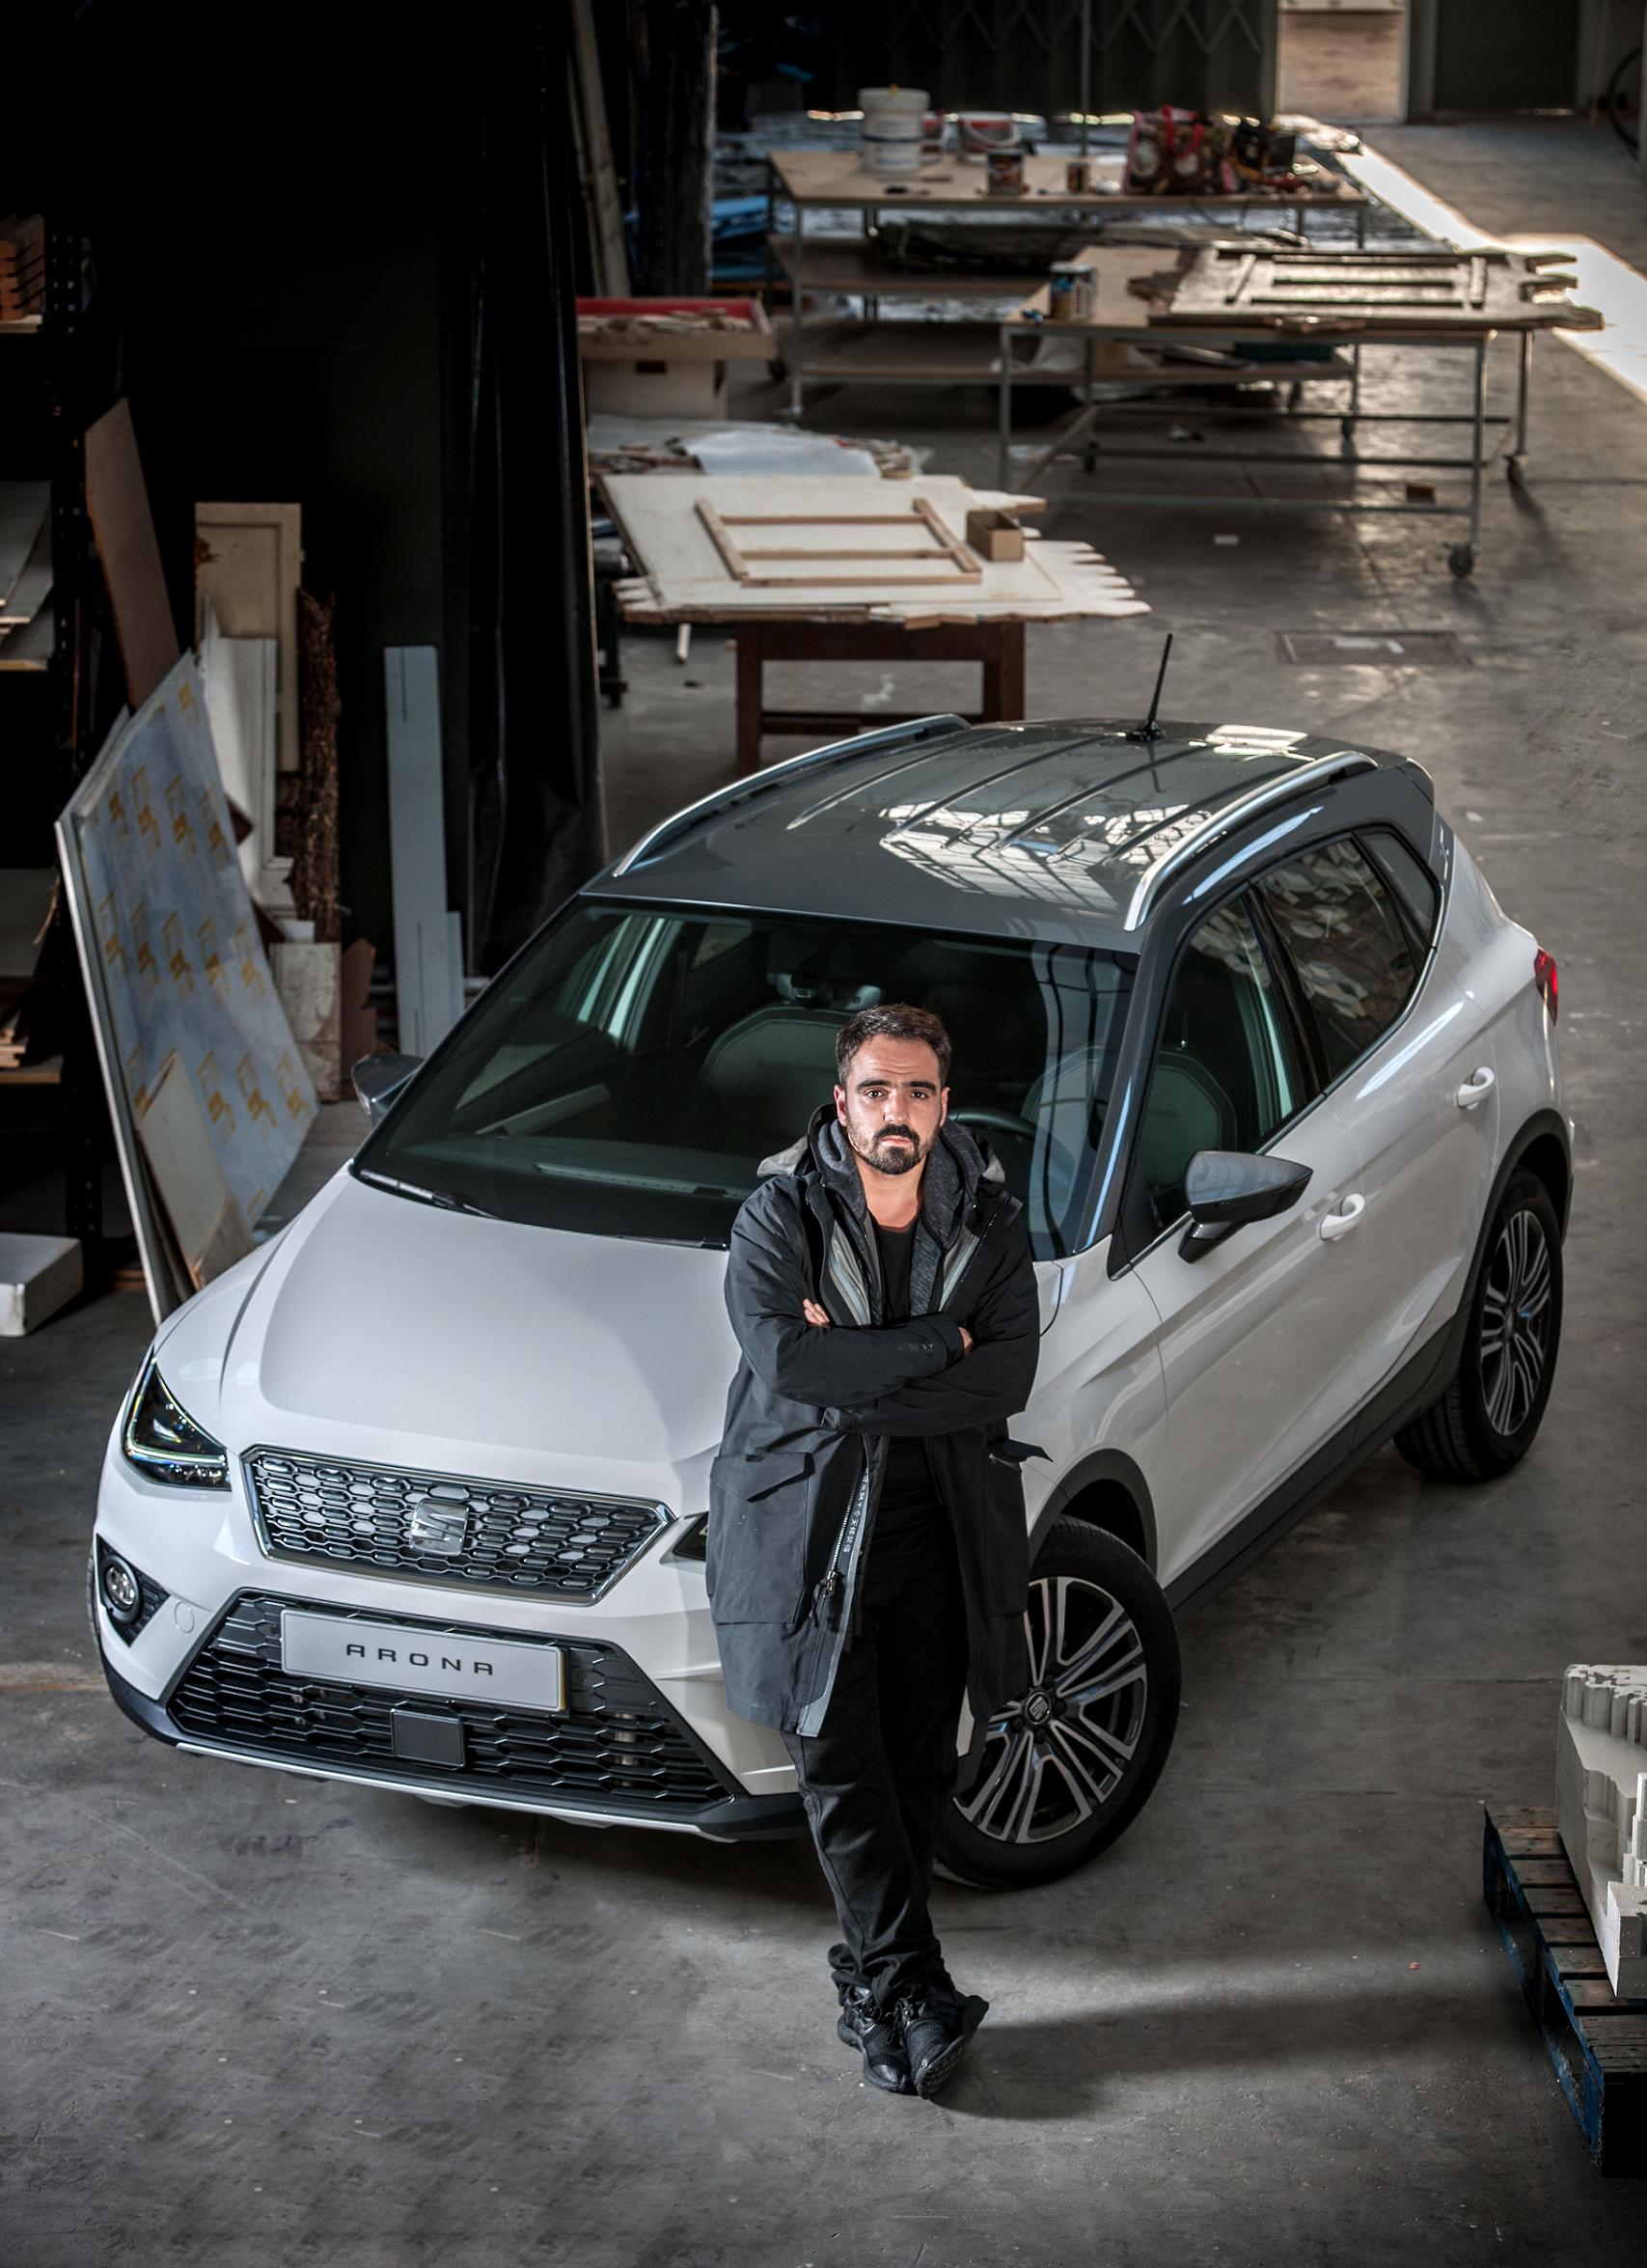 VHILS colabora com a Seat para promover o novo SUV Arona thumbnail